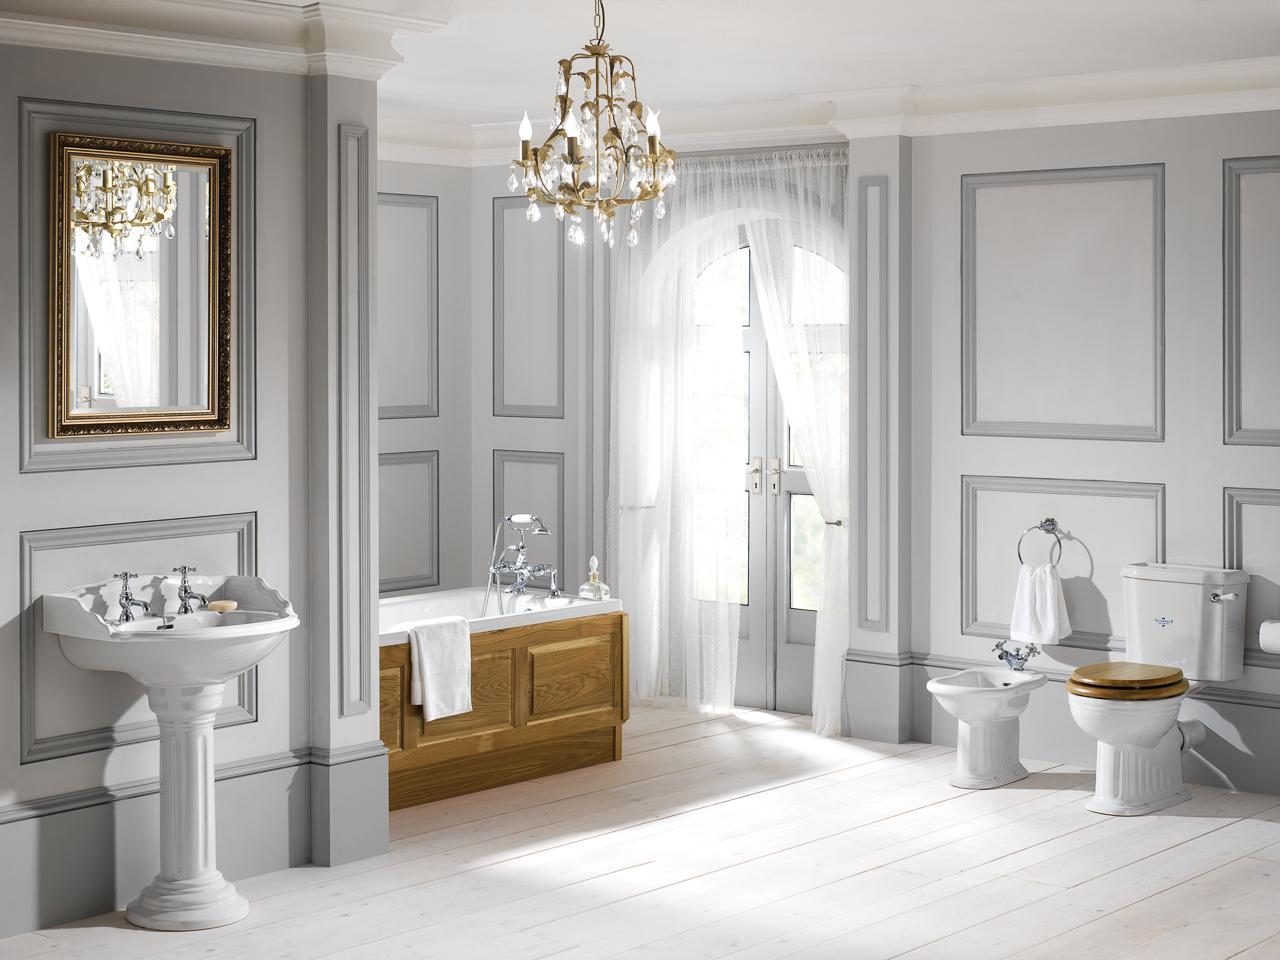 Silverdale Bathrooms: Belgravia Roomset